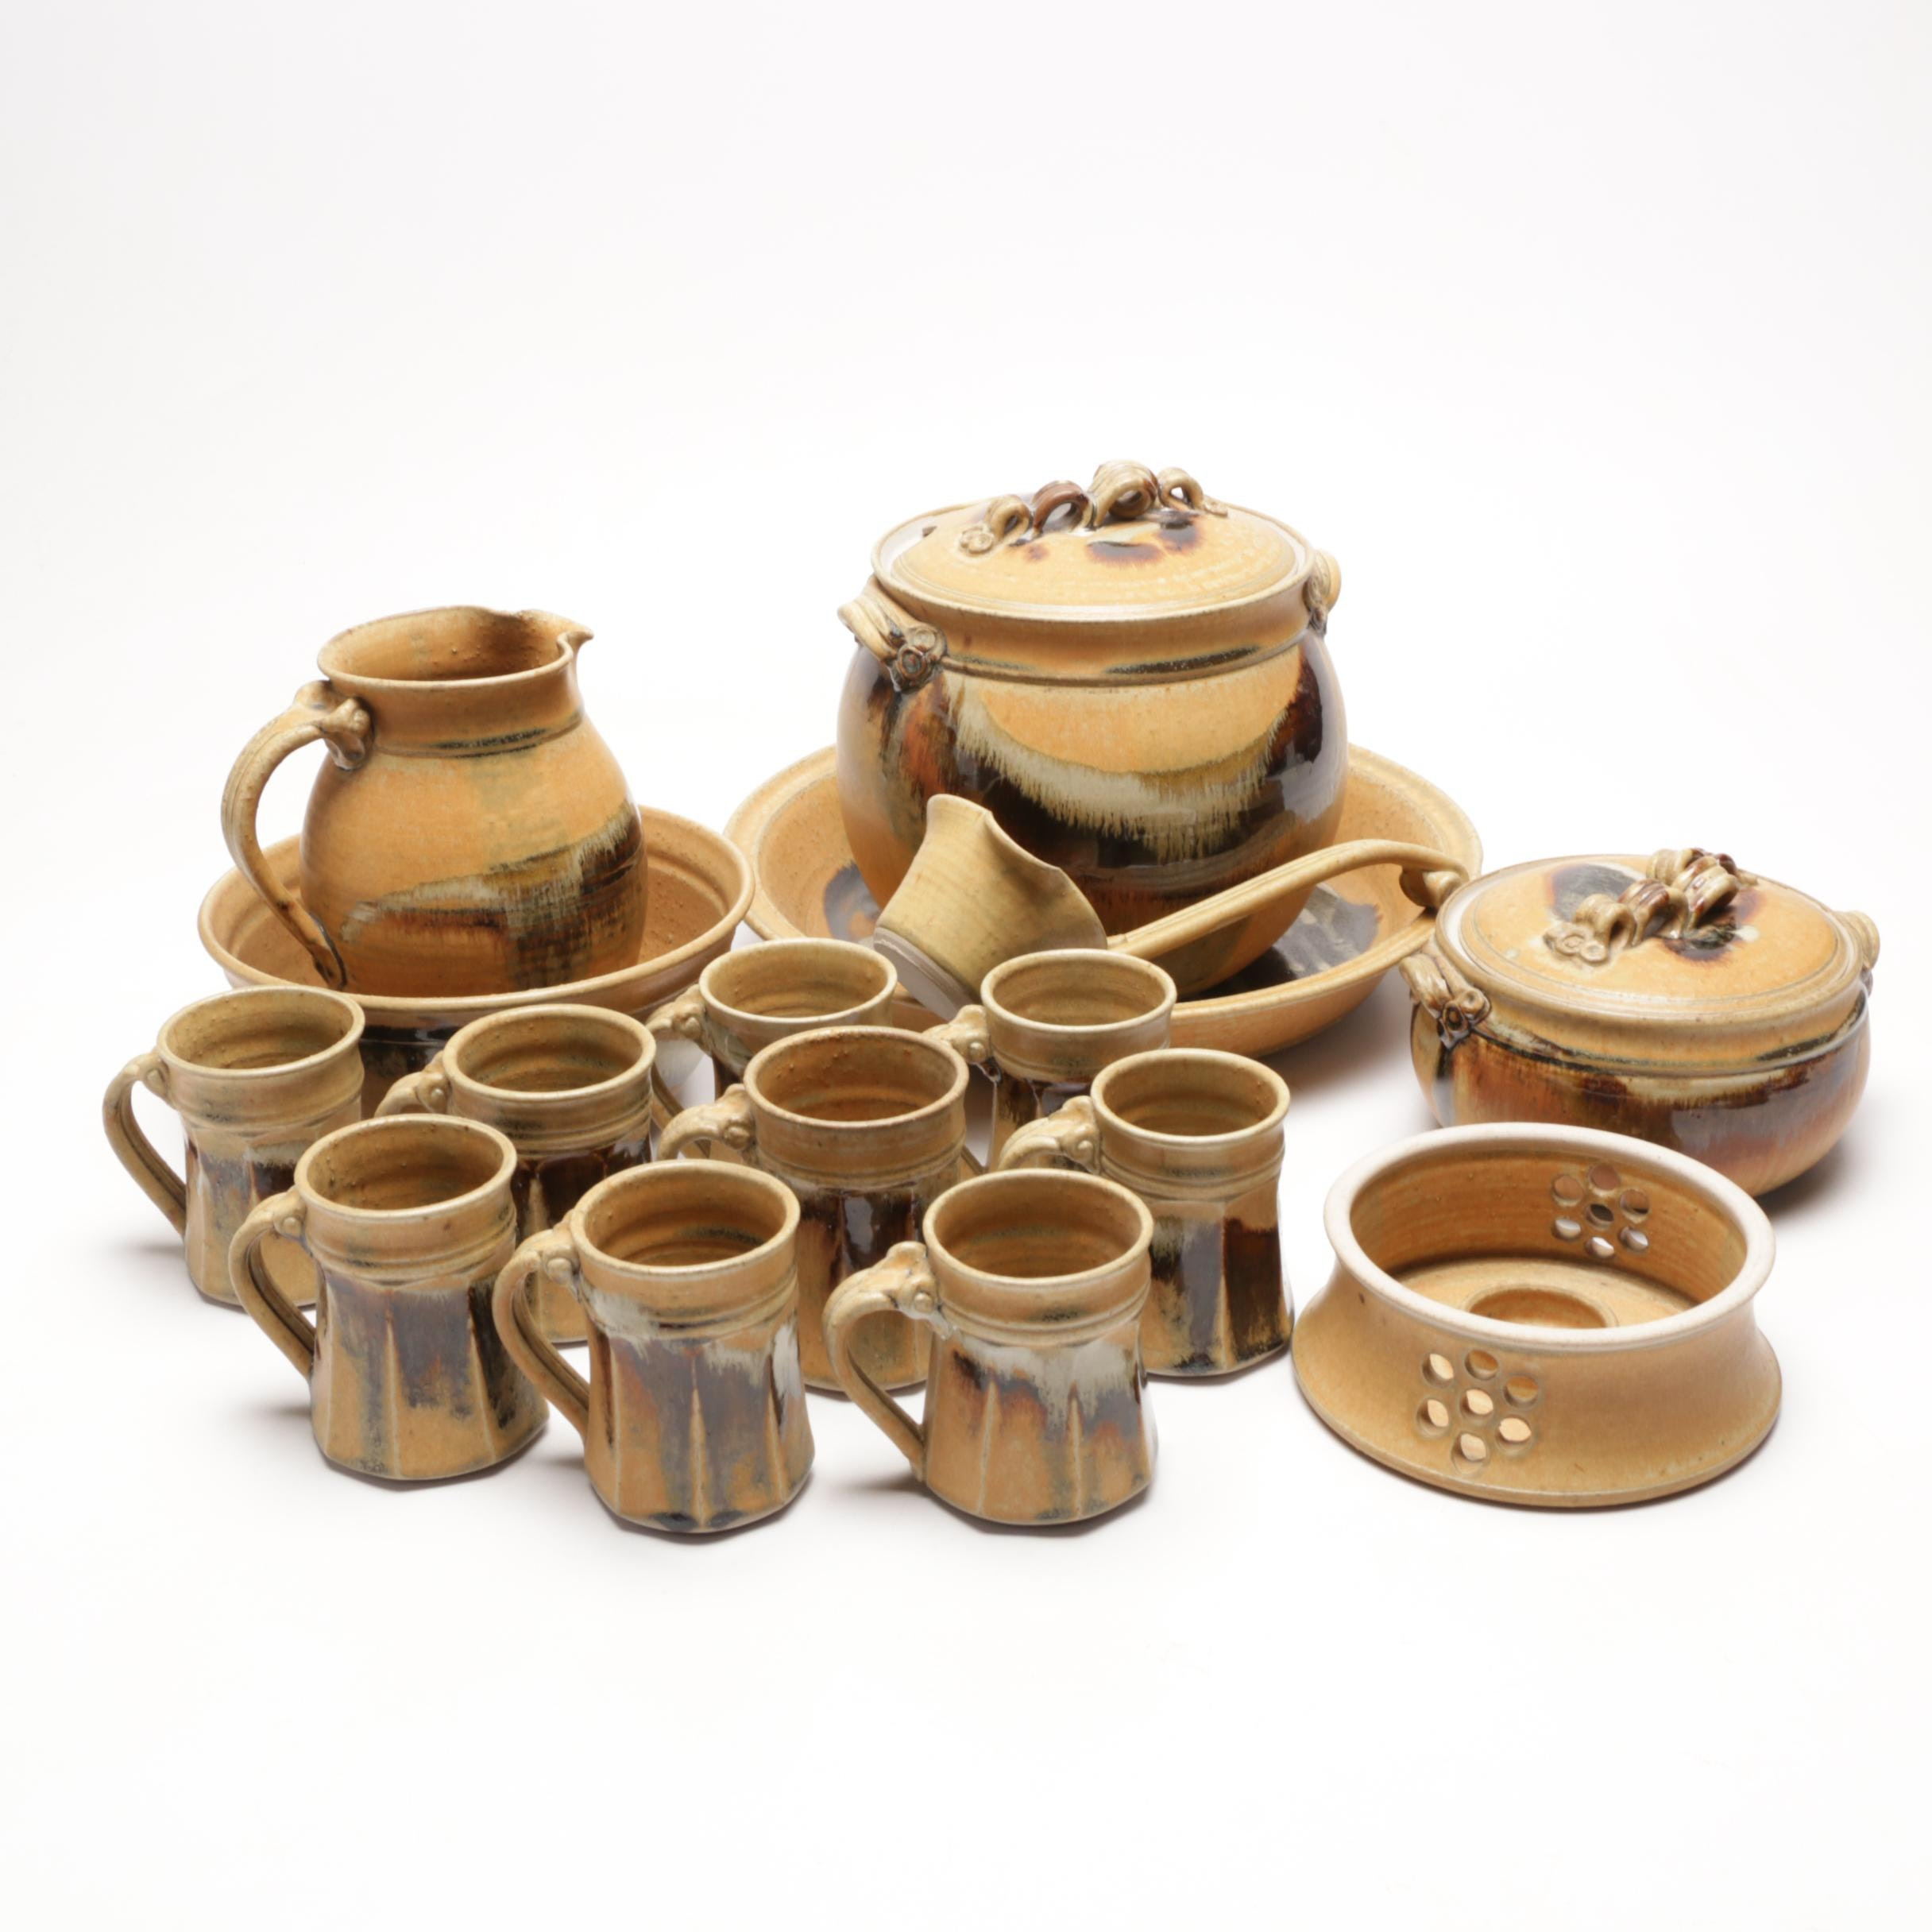 RW Pottery Thrown Stoneware Dinnerware